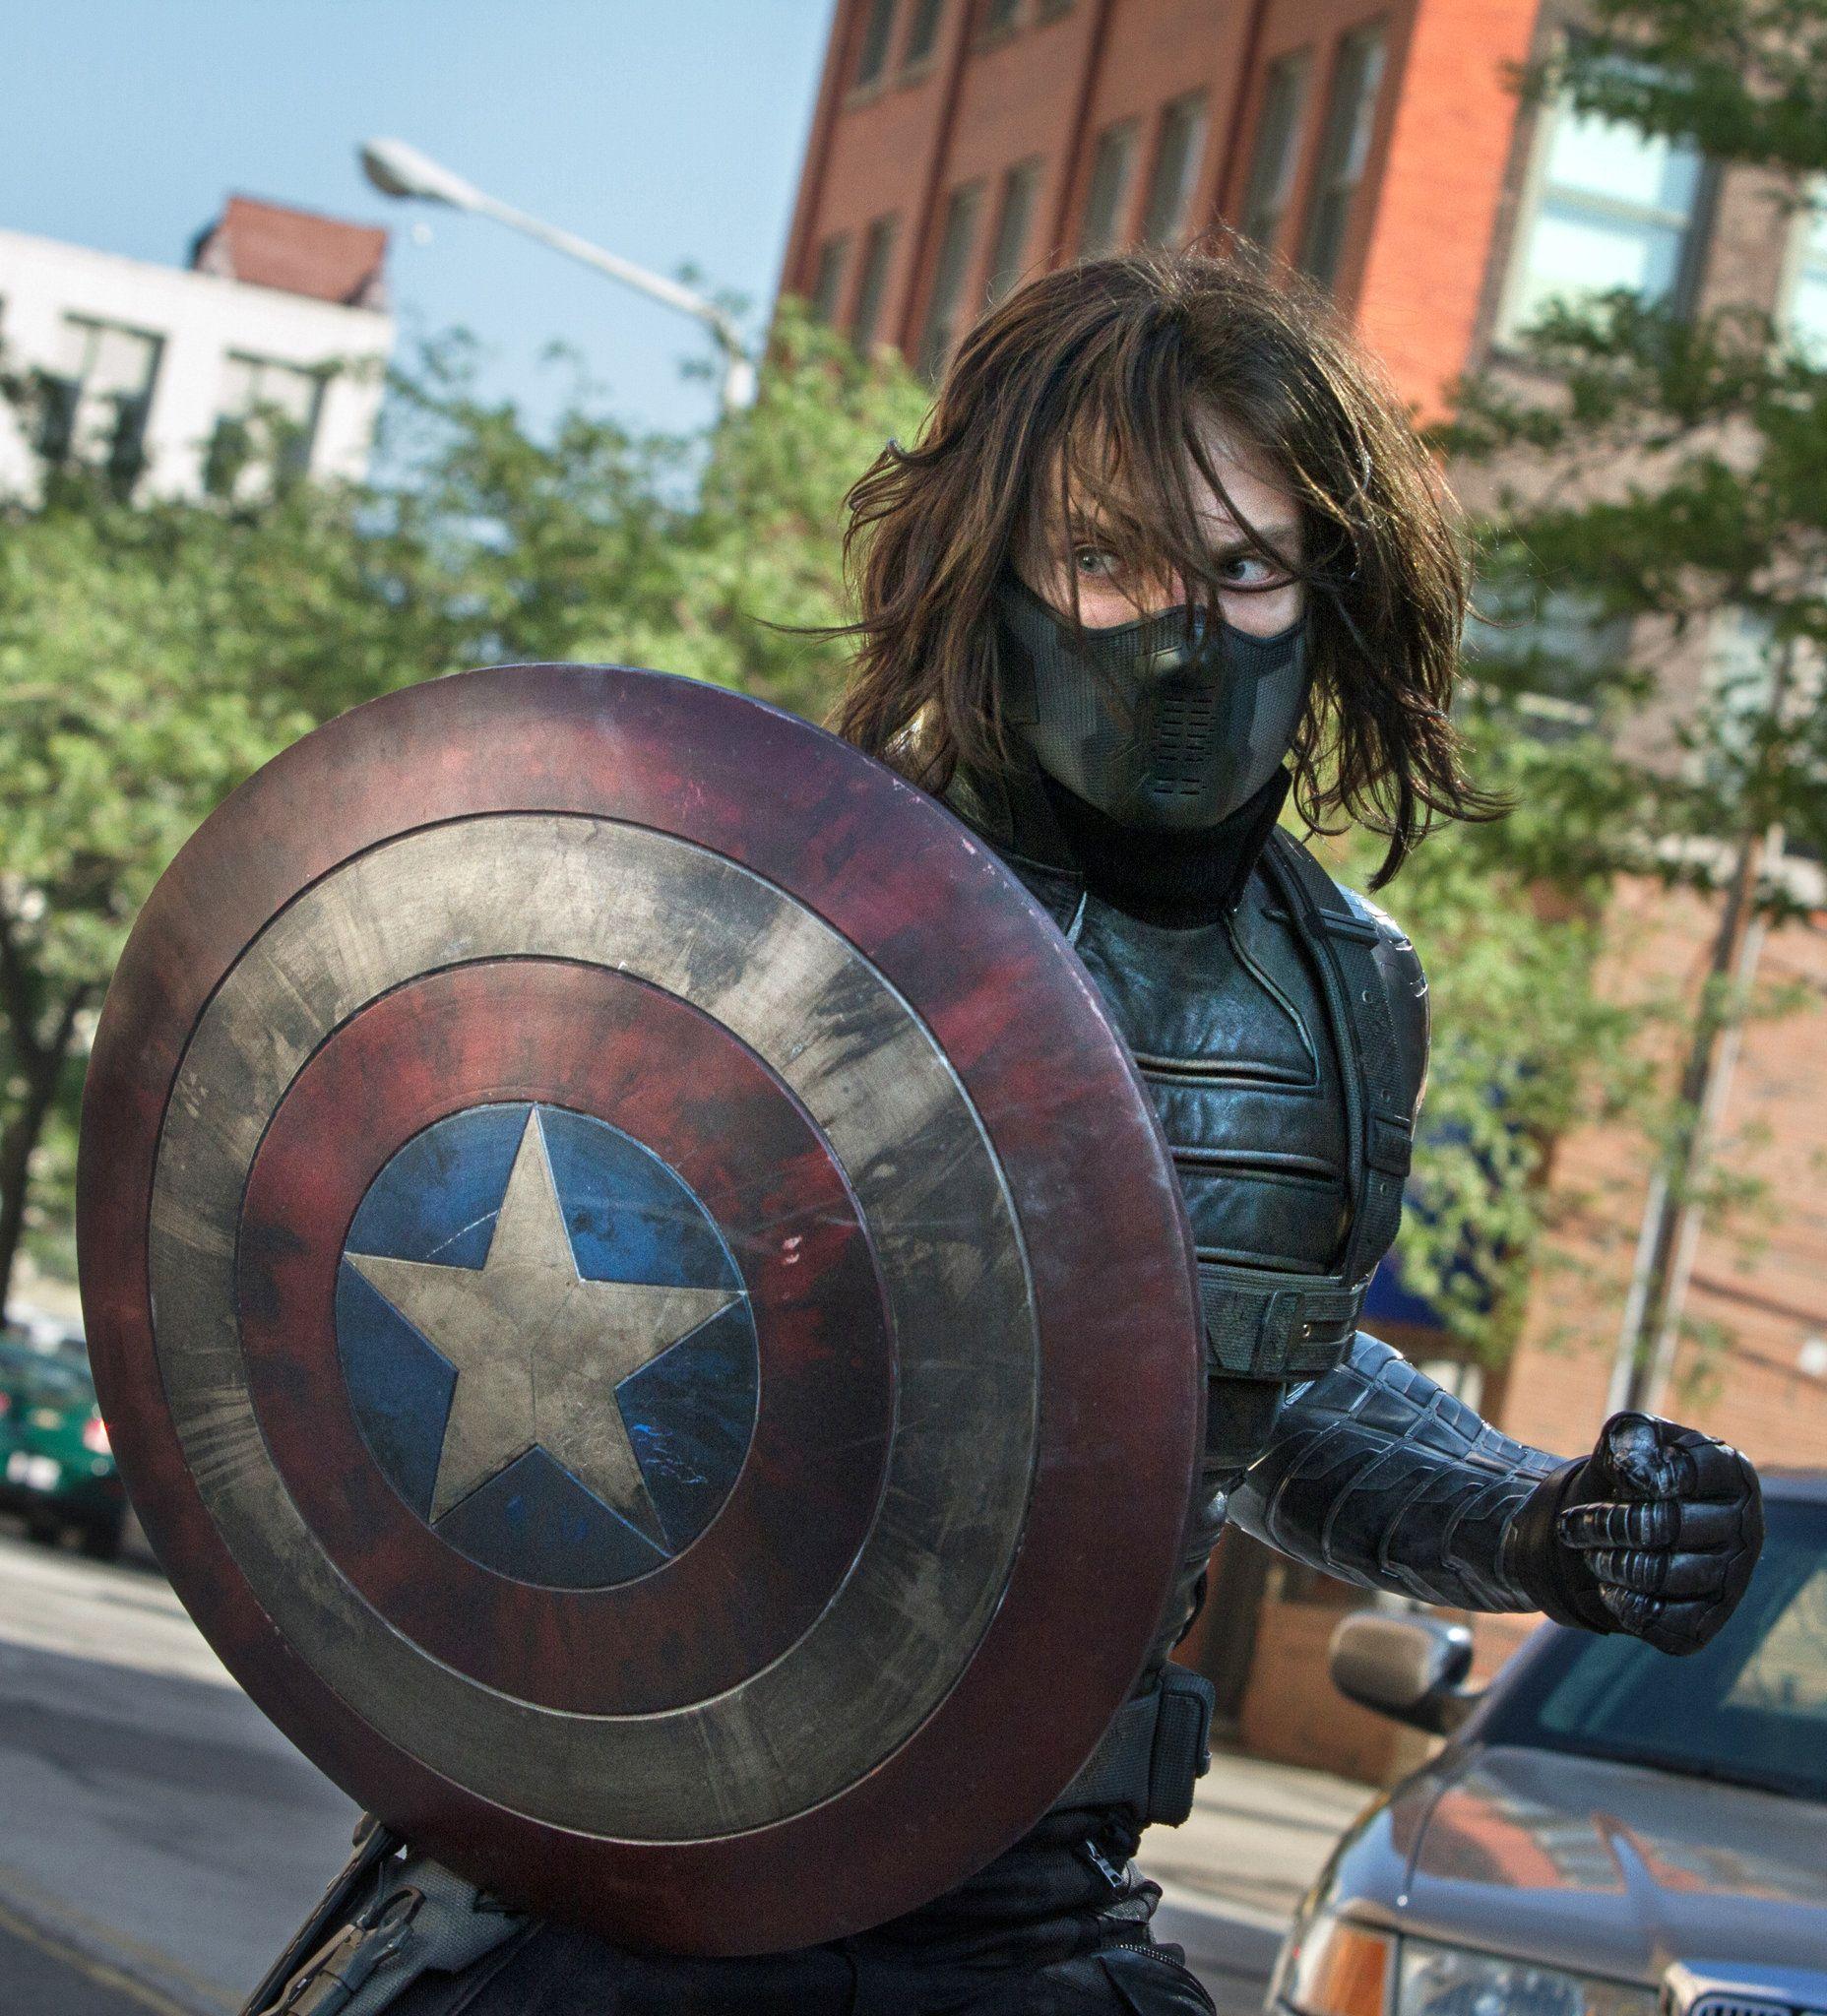 Hero Returns In 'Captain America: The Winter Soldier